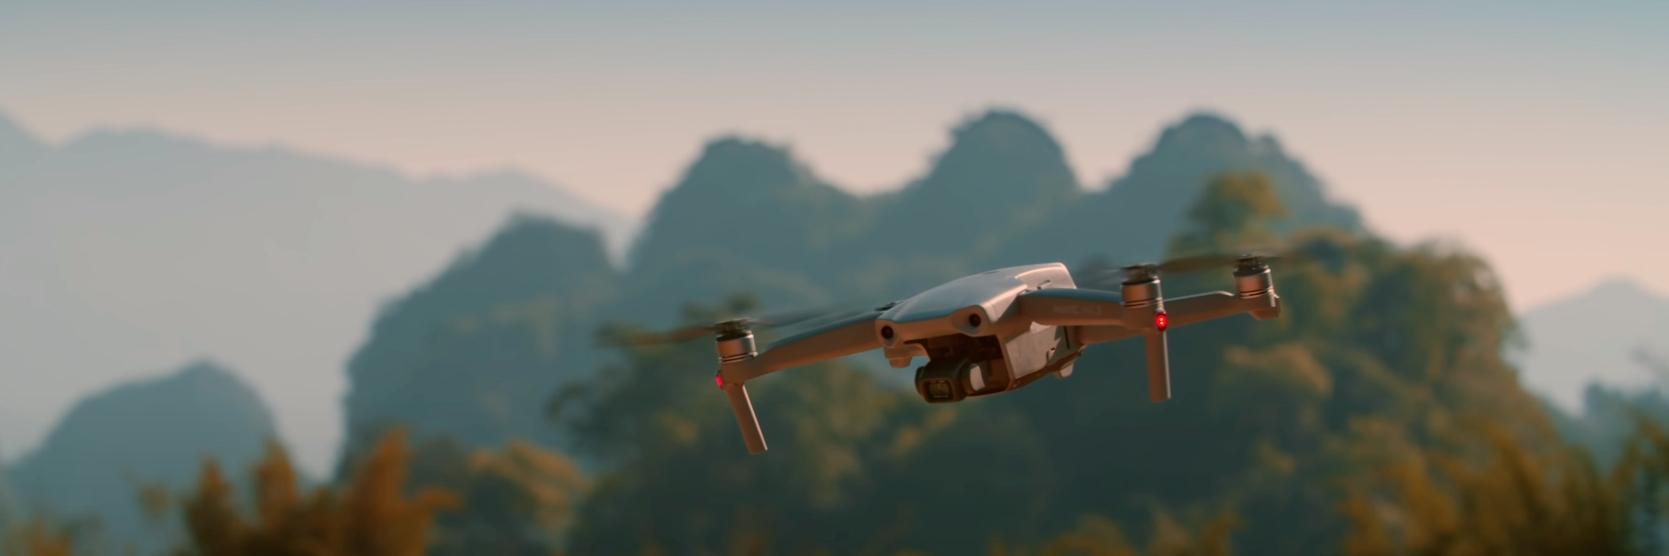 DJI Mavic Air 2 - ein neues Abenteuer